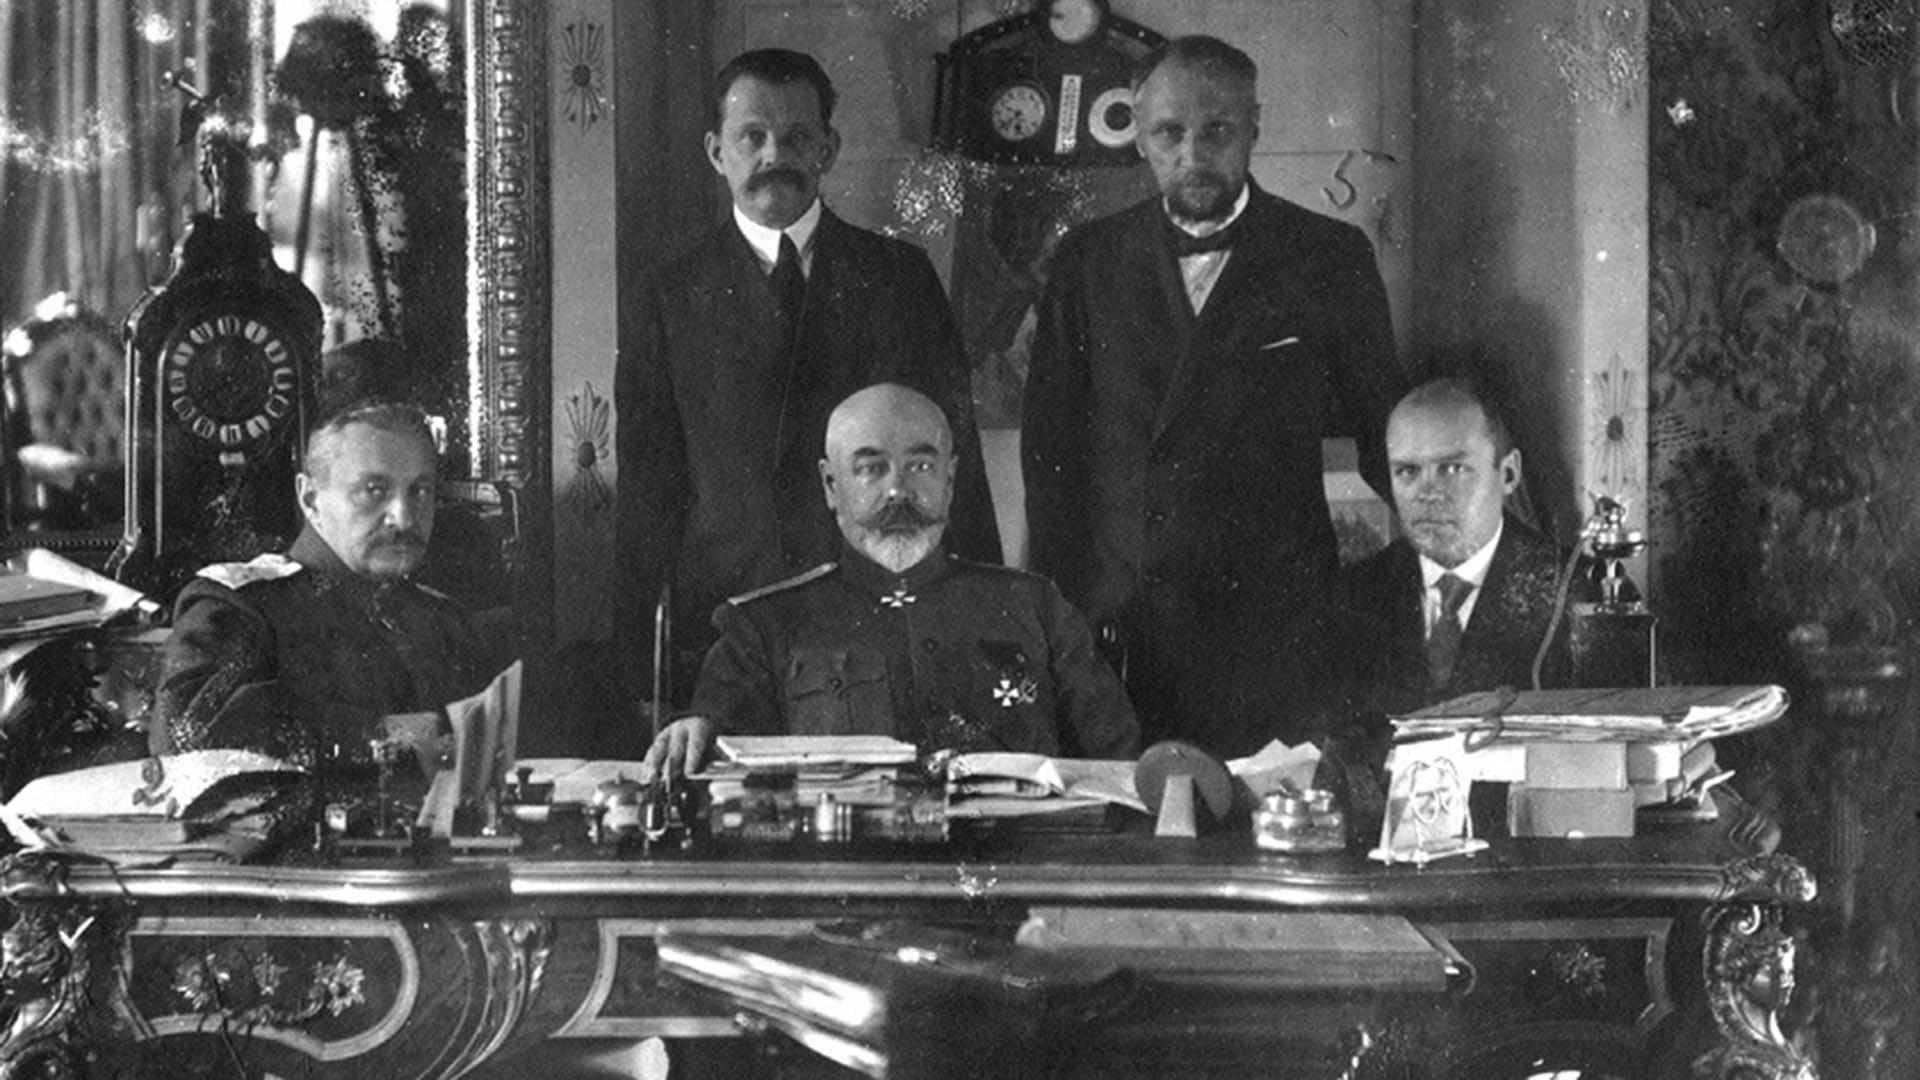 Été 1919. Taganrog. De gauche à droite, le général Ivan Romanovski, le général Anton Dénikine, Nikolaï Sokolov. Debout - Nikolaï Astrov, Nikolaï Savitch